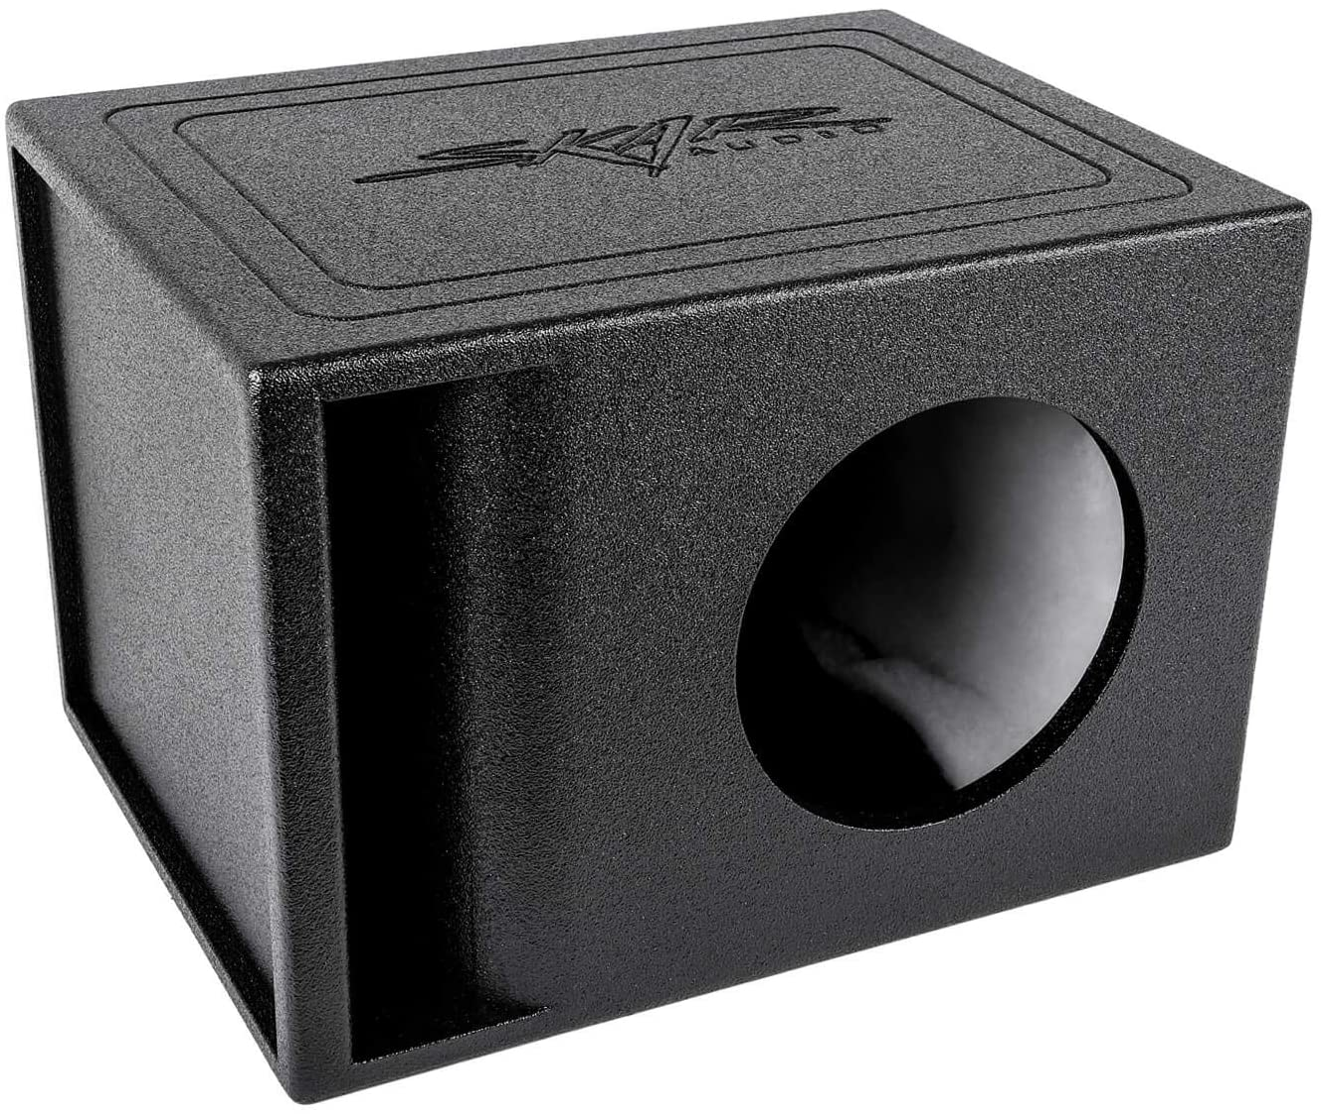 "Skar Audio AR1X8V Single 8"" Universal Fit Armor Coated Ported Subwoofer Box with Kerf Port"